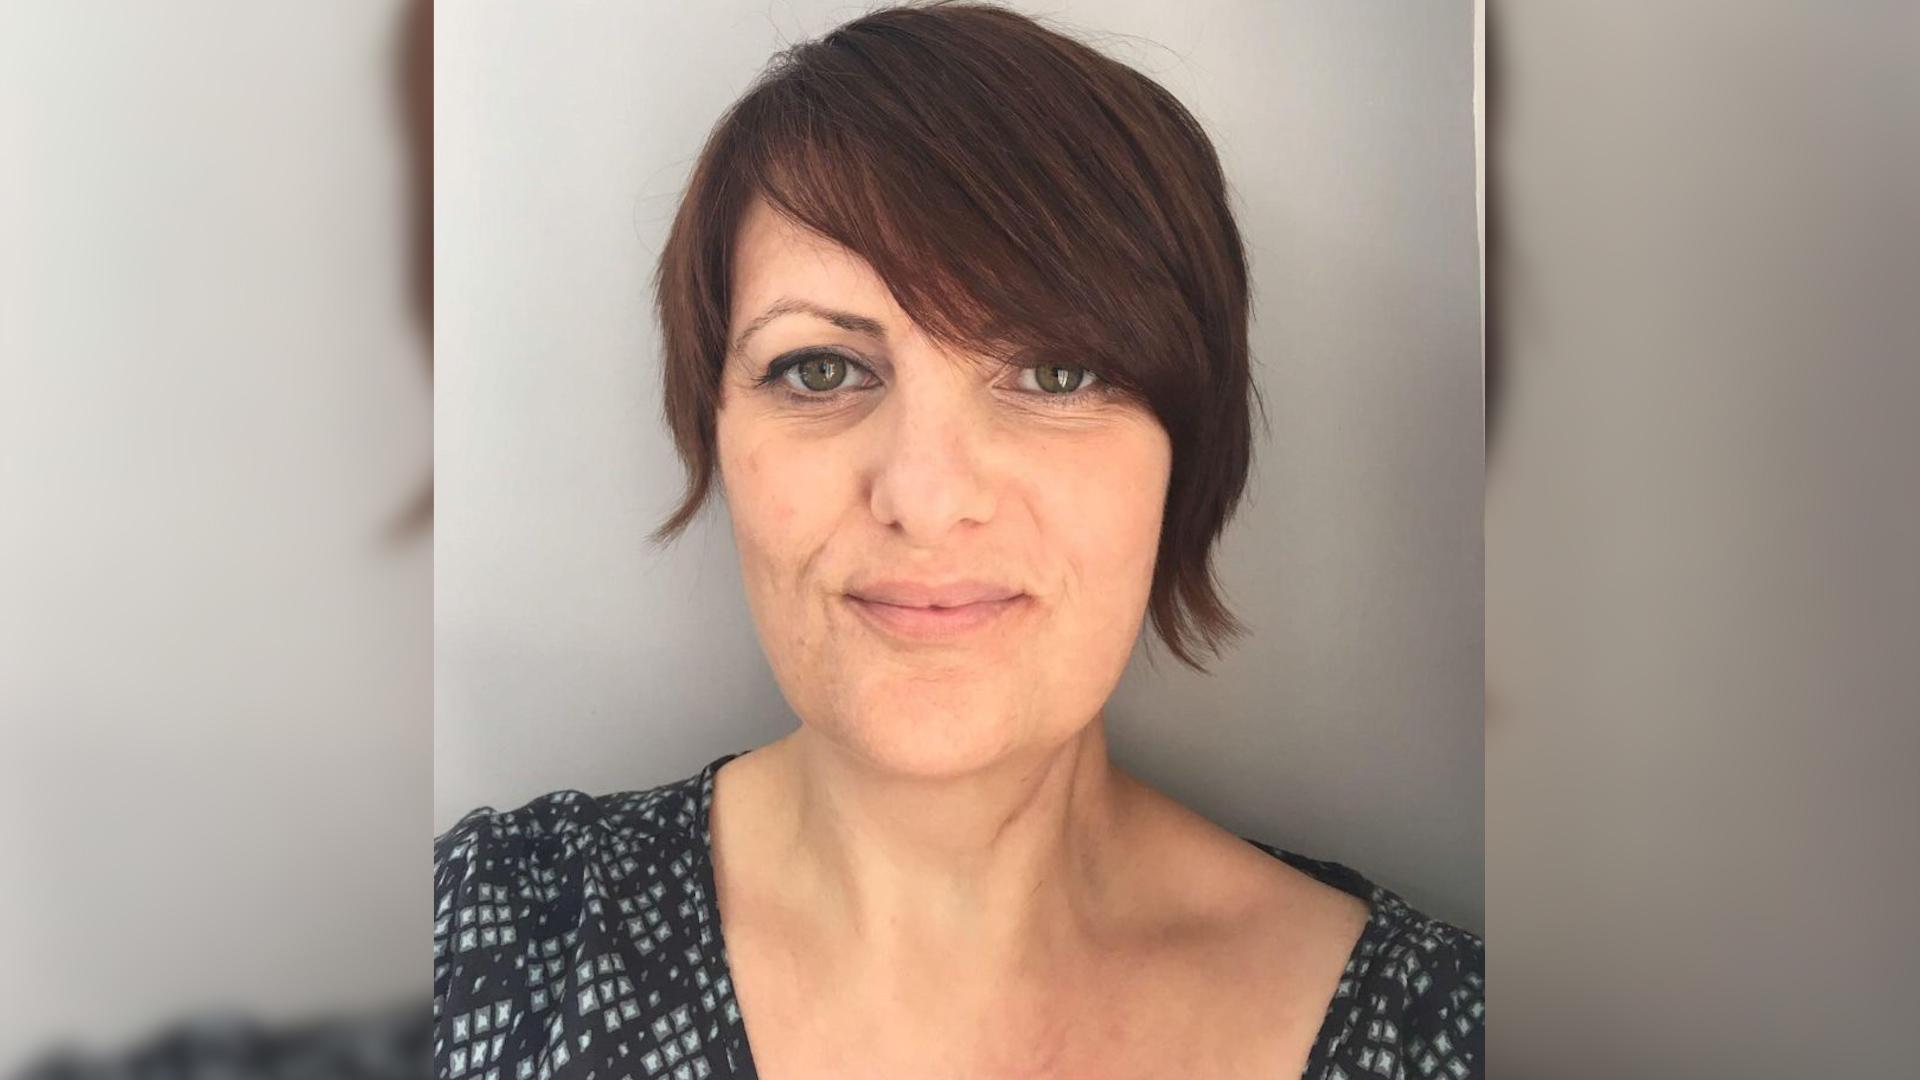 Matka straciła ucho - rak po opalaniu